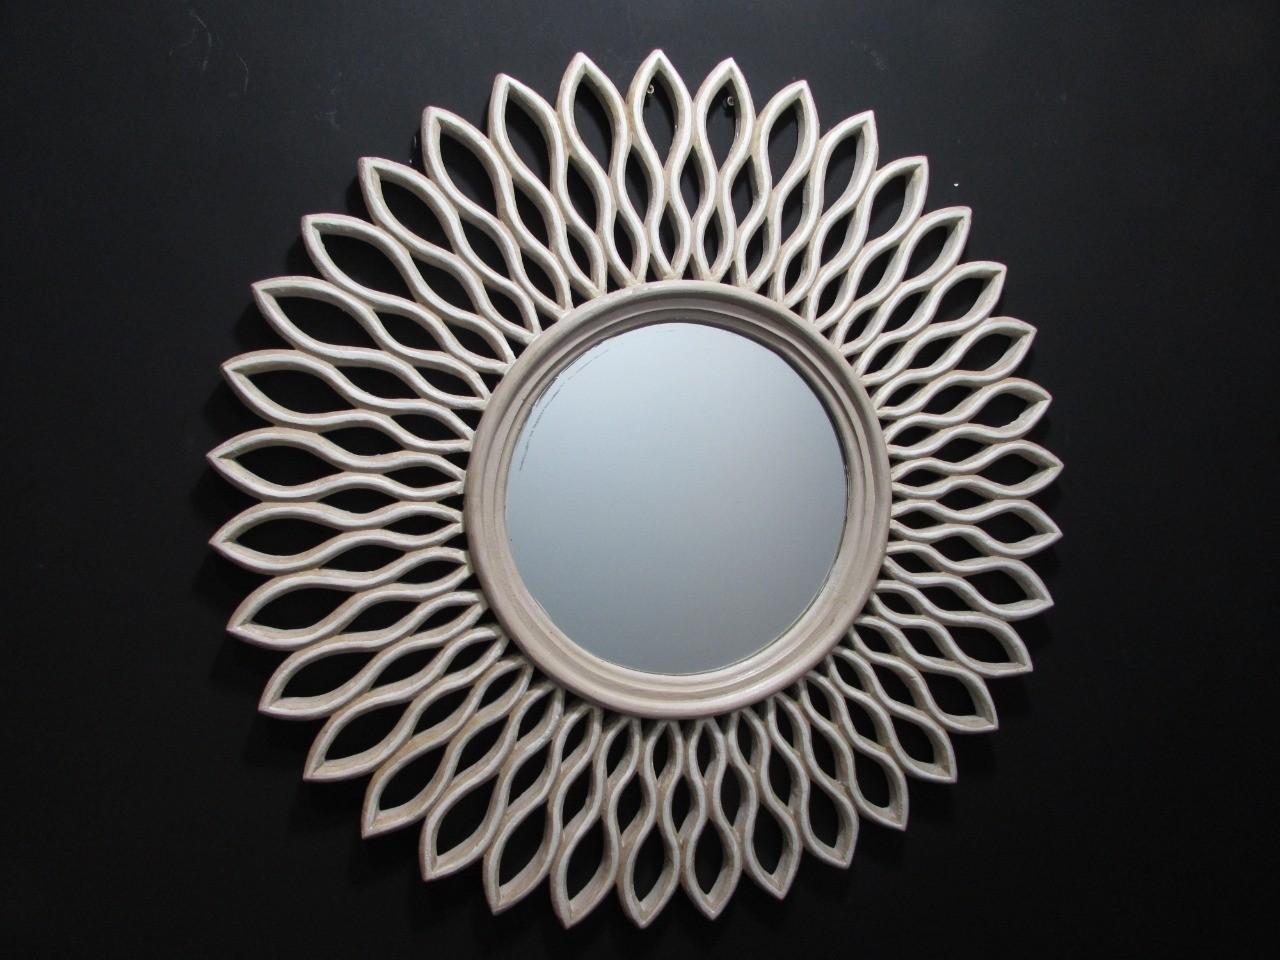 Espelho Redondo com Moldura estilo raio de Sol - Frontier